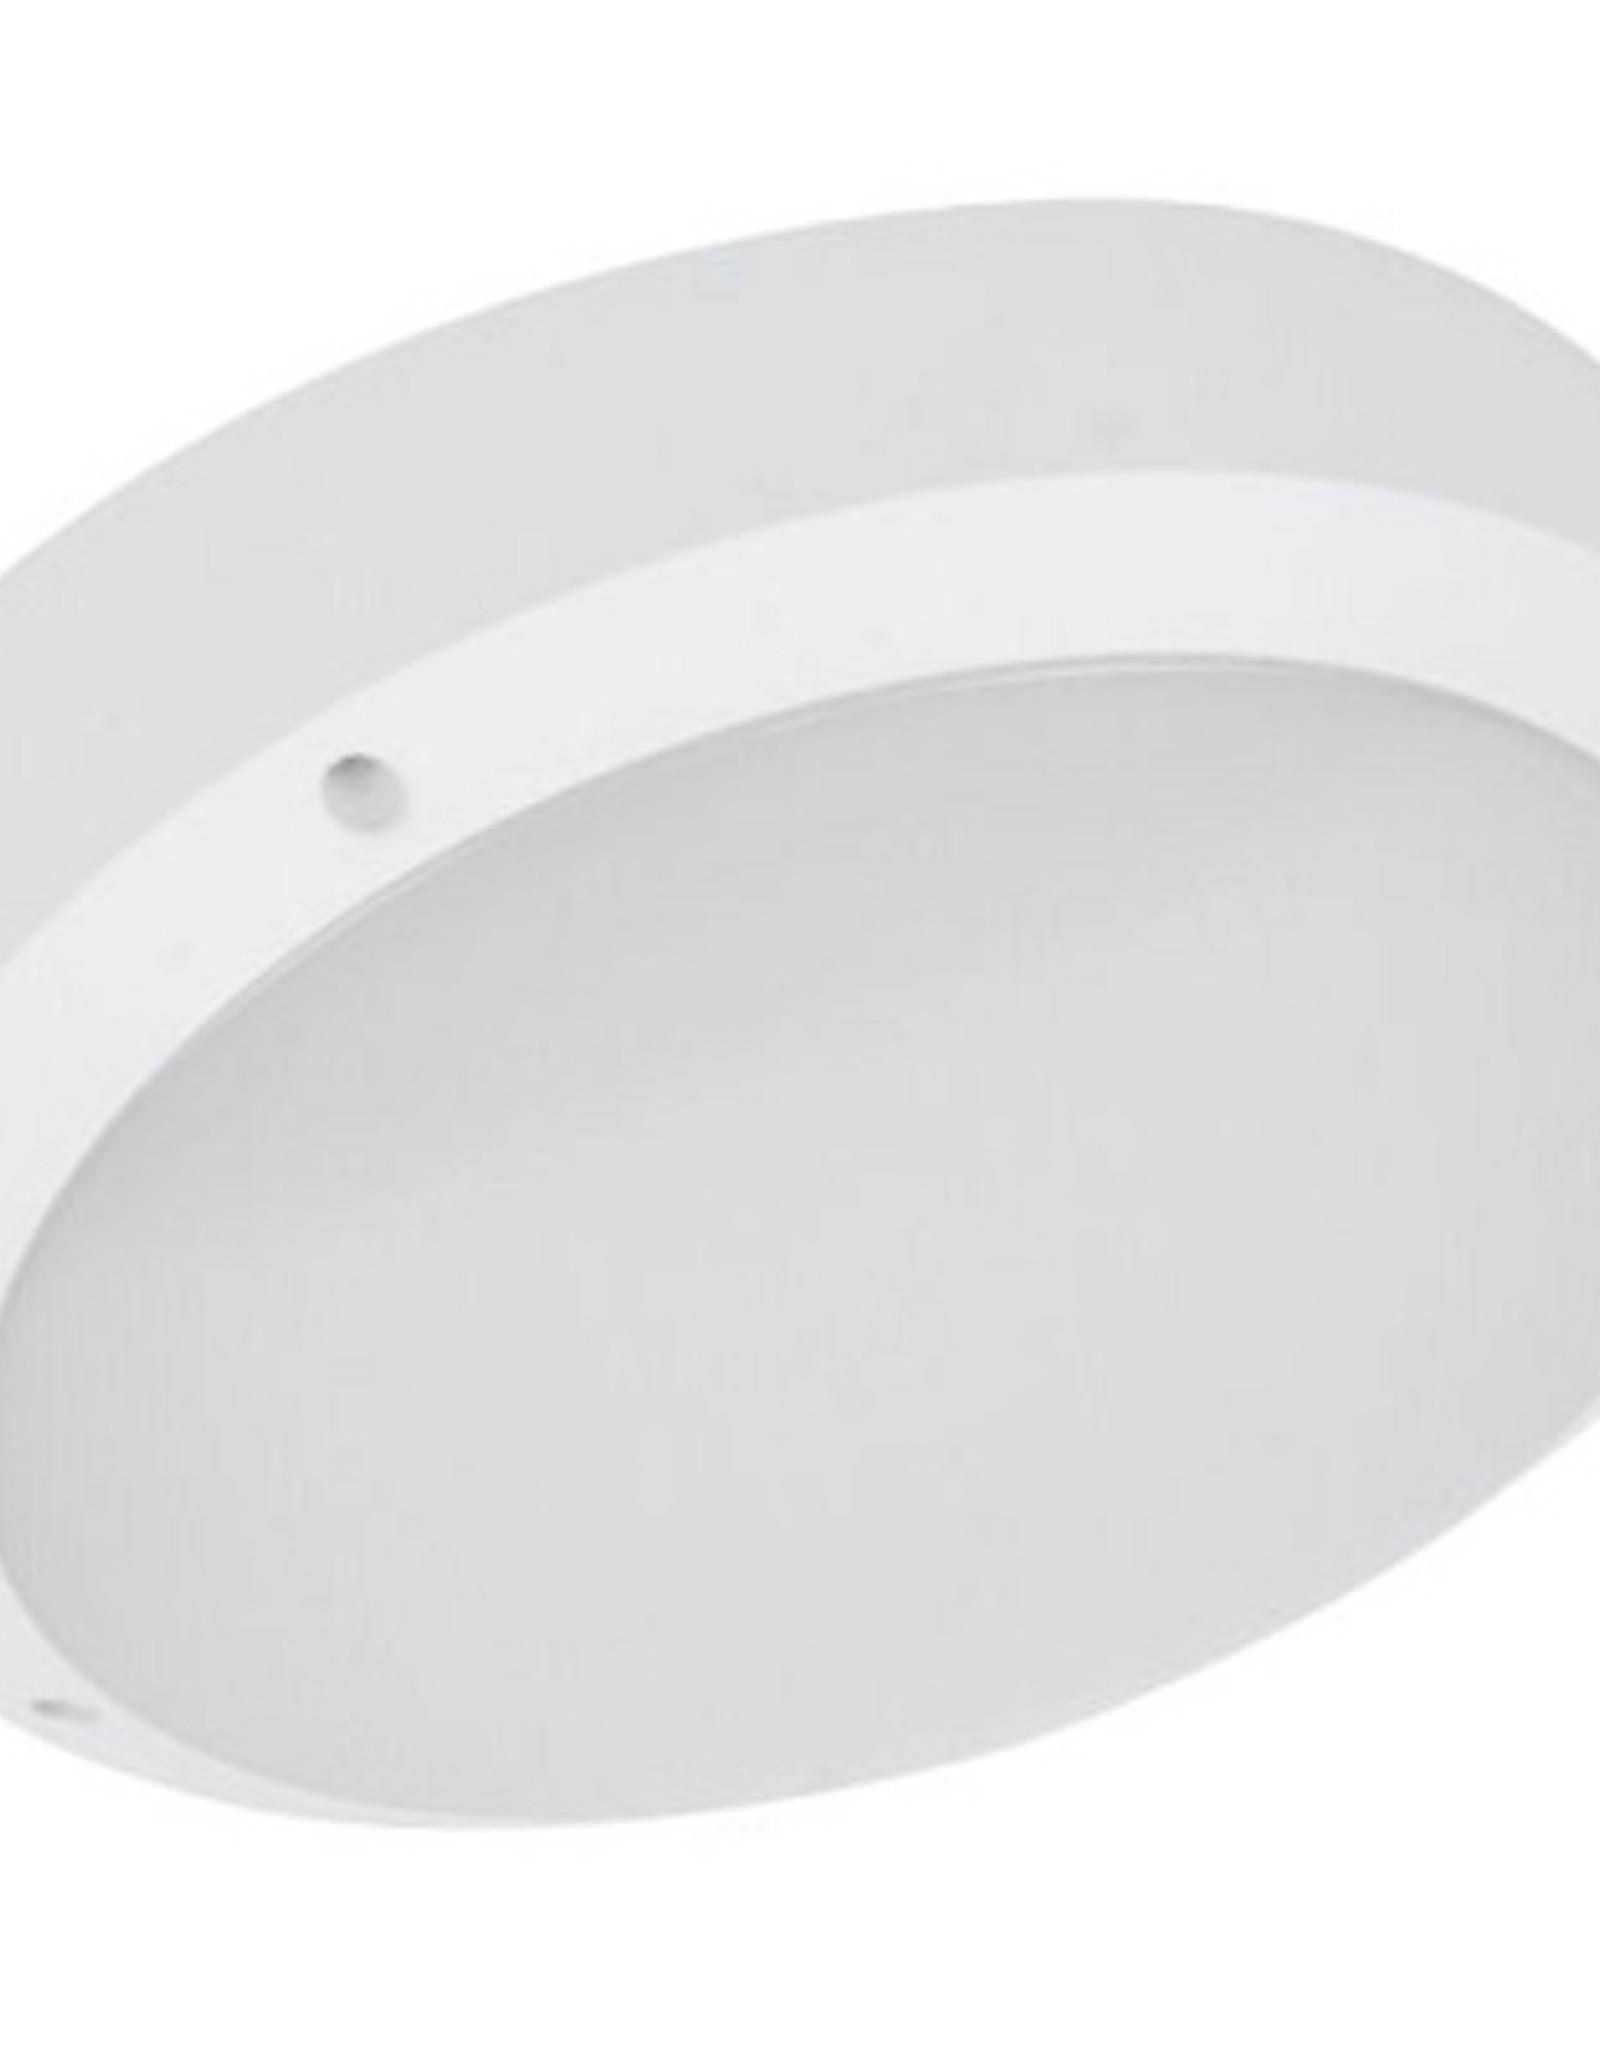 LedLed LED Plafonniere IK10 ROLO 12W 3000k